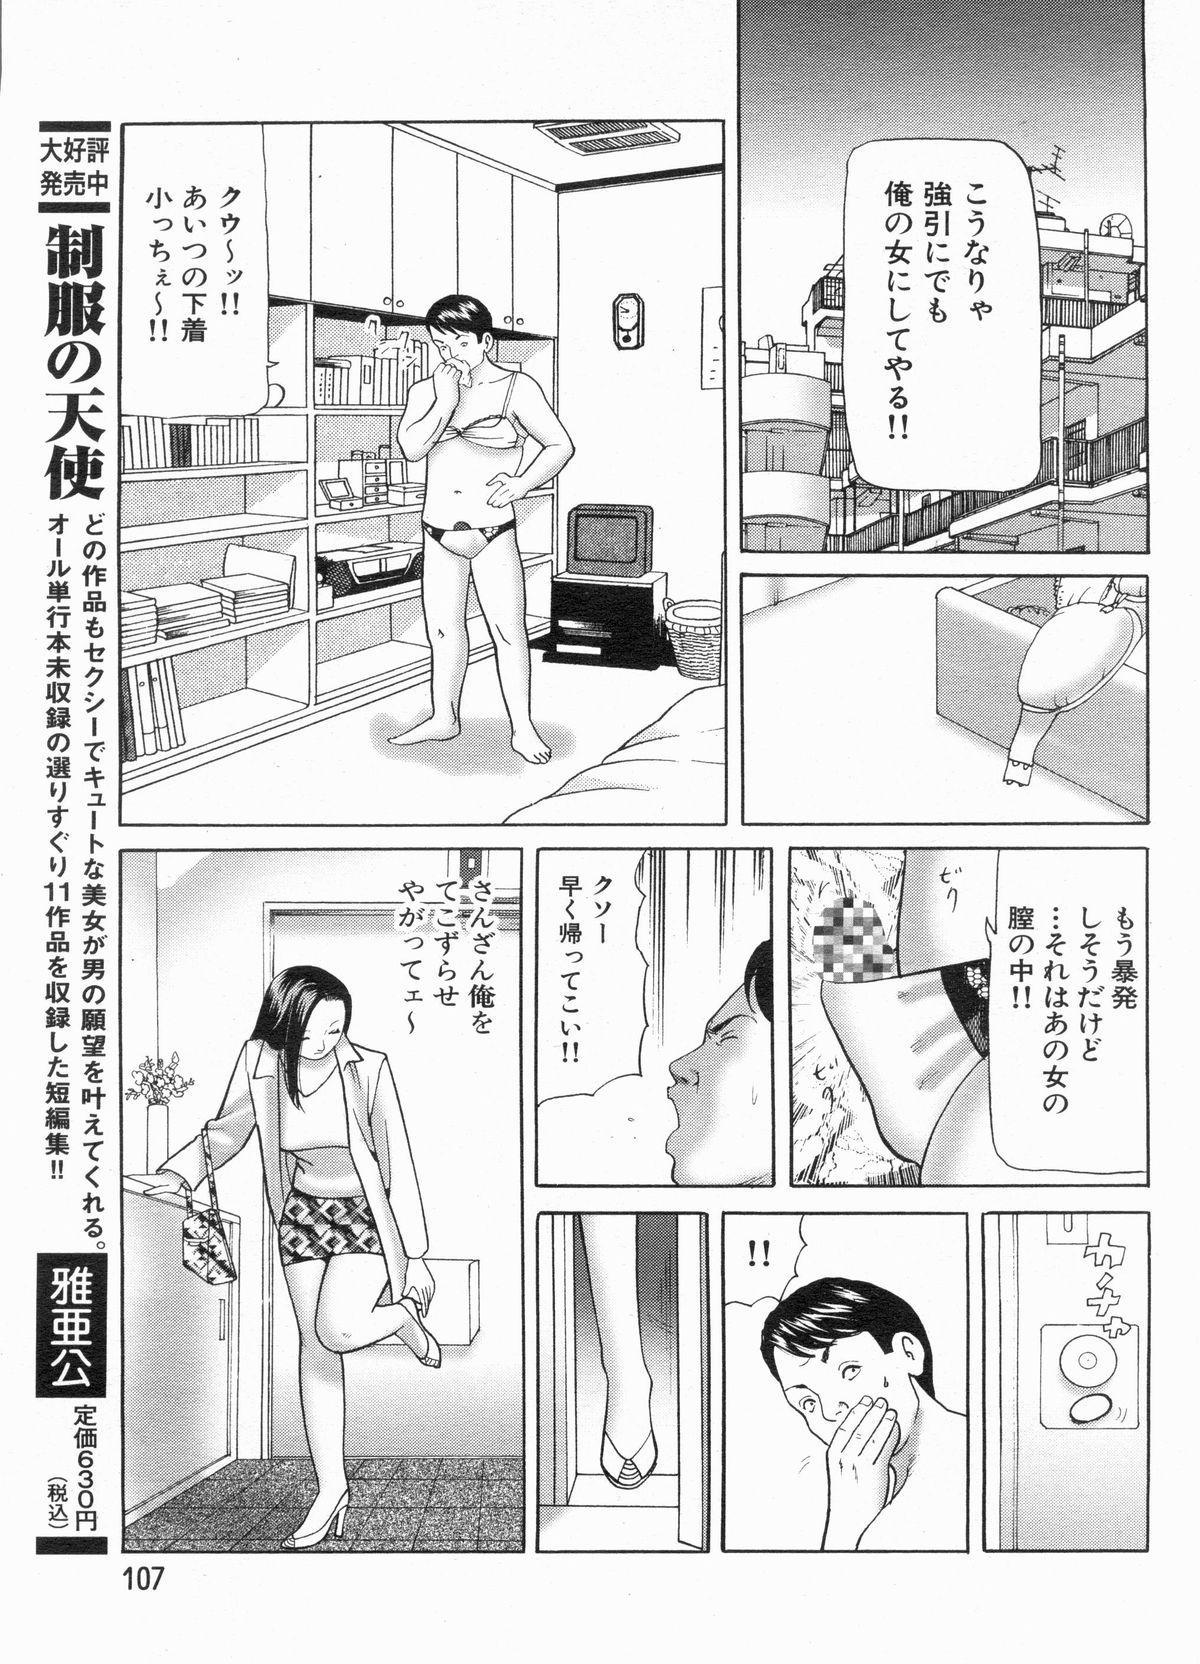 Manga Bon 2013-03 105